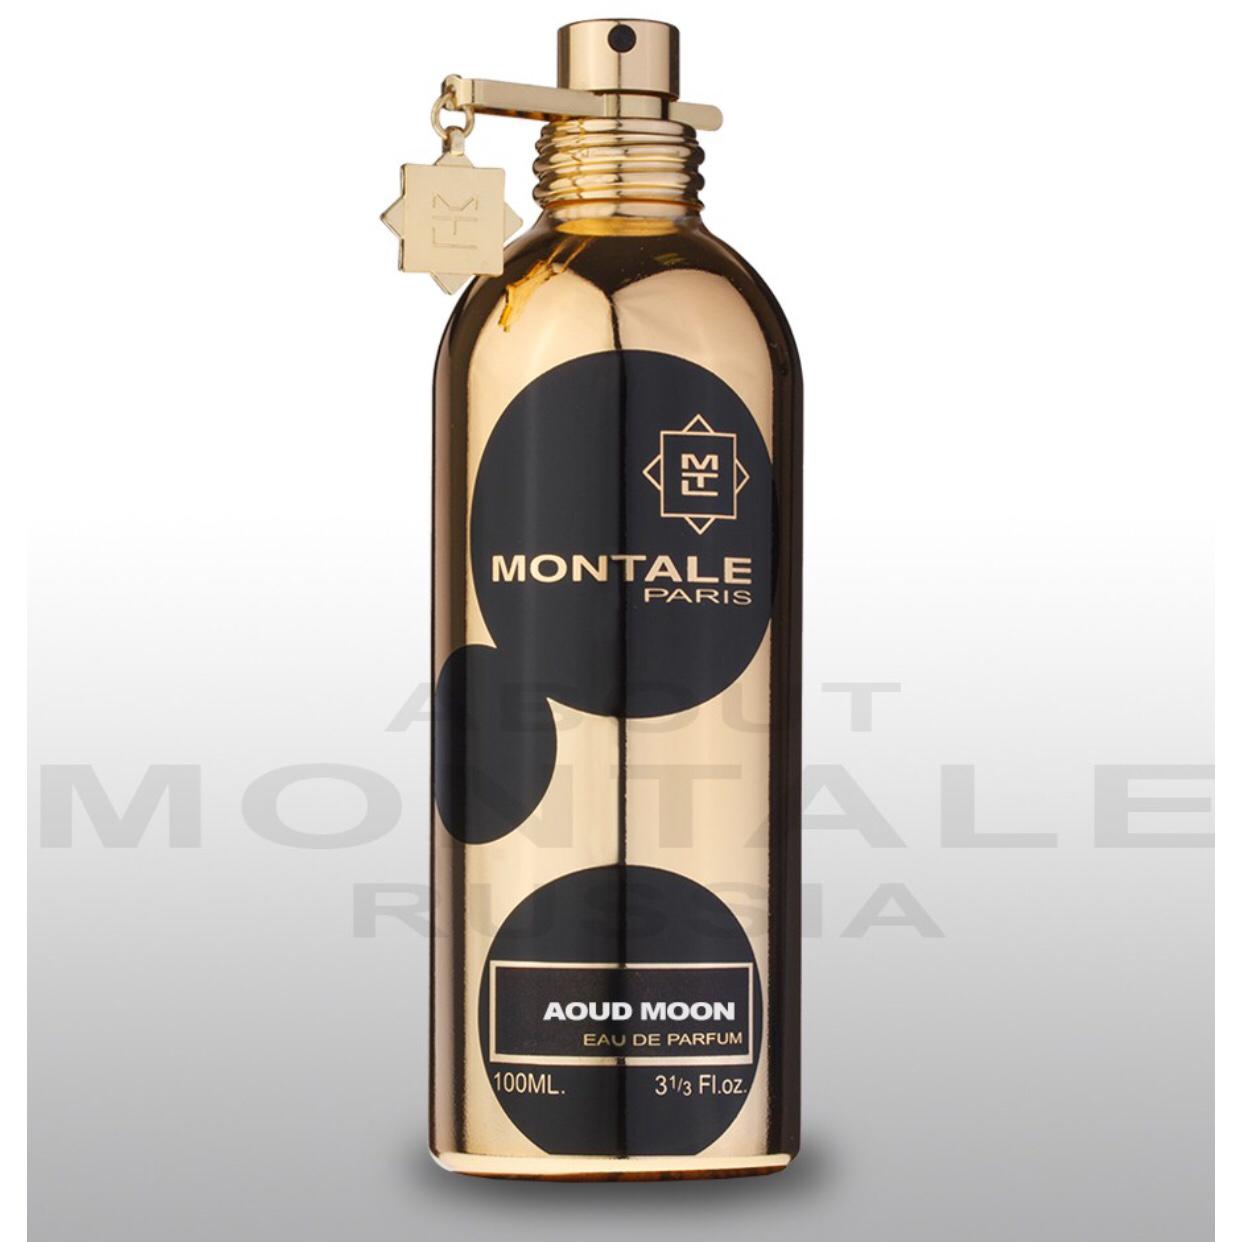 Montale - Aoud Moon